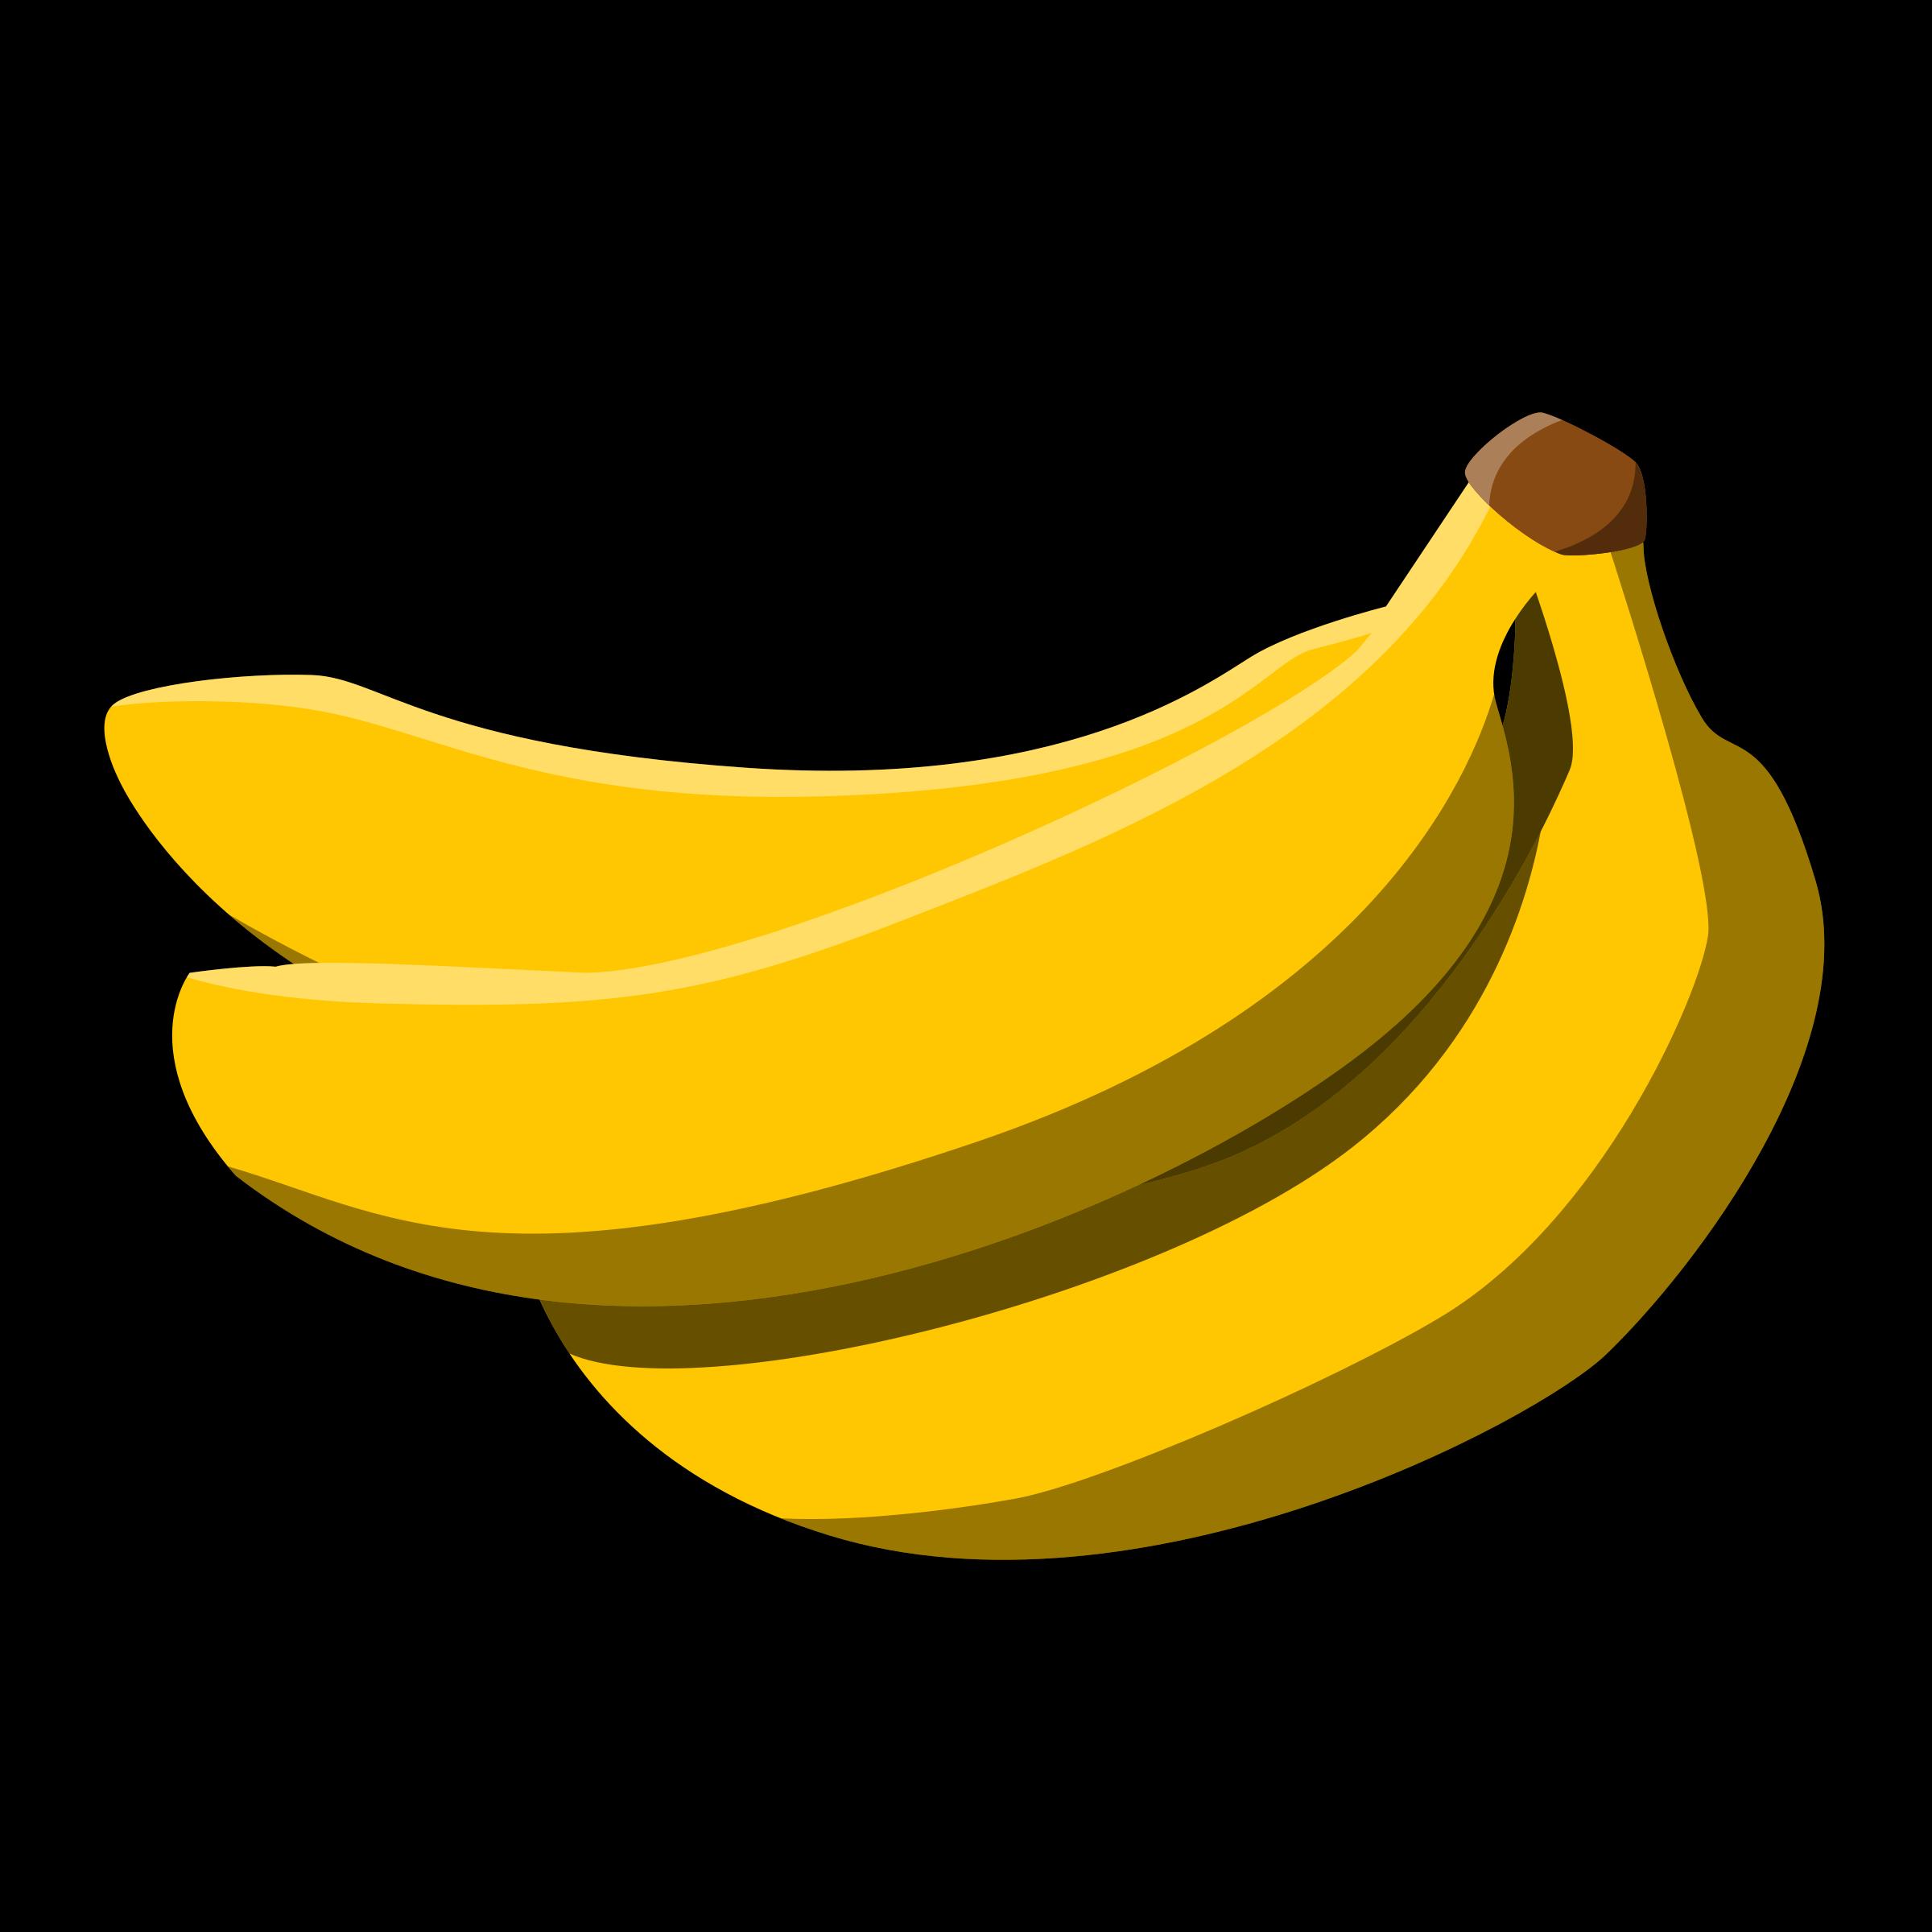 Clipart banana logo, Clipart banana logo Transparent FREE.